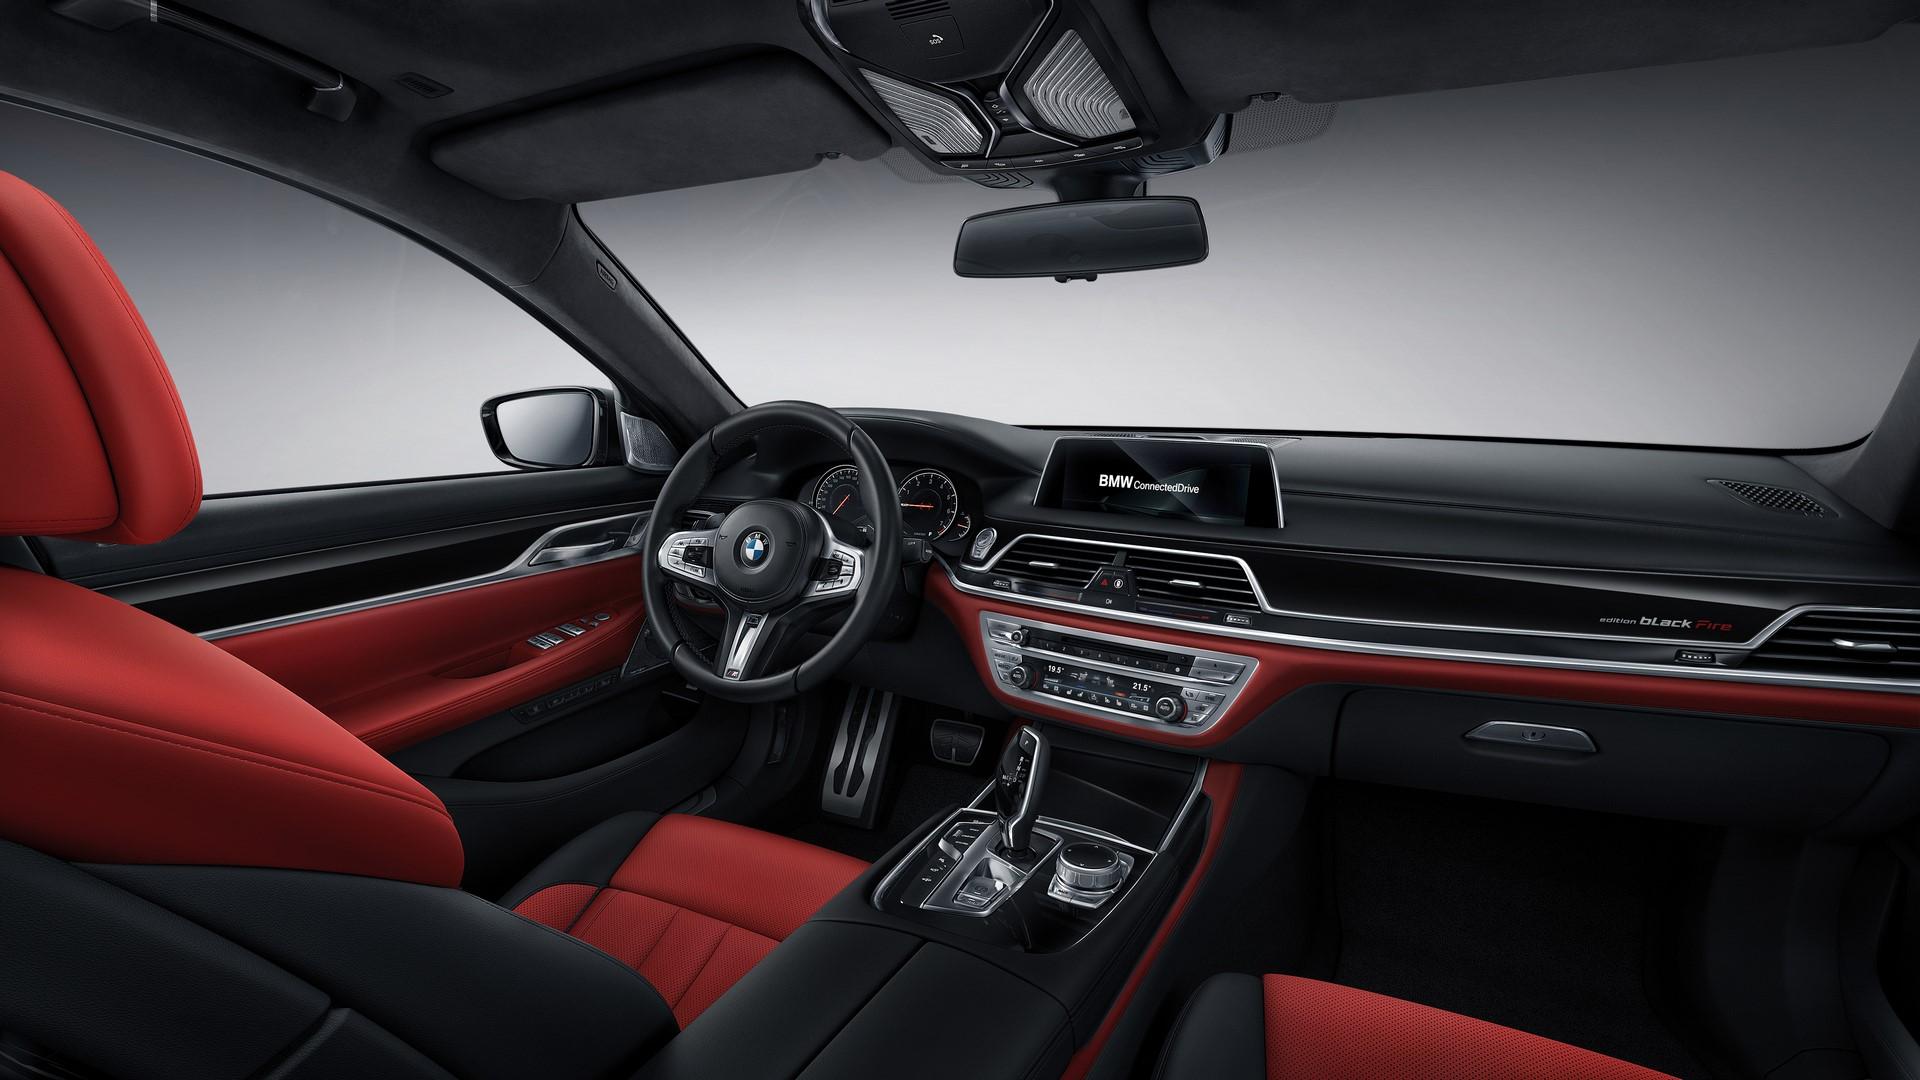 BMW 7-Series Black Fire Edition (4)